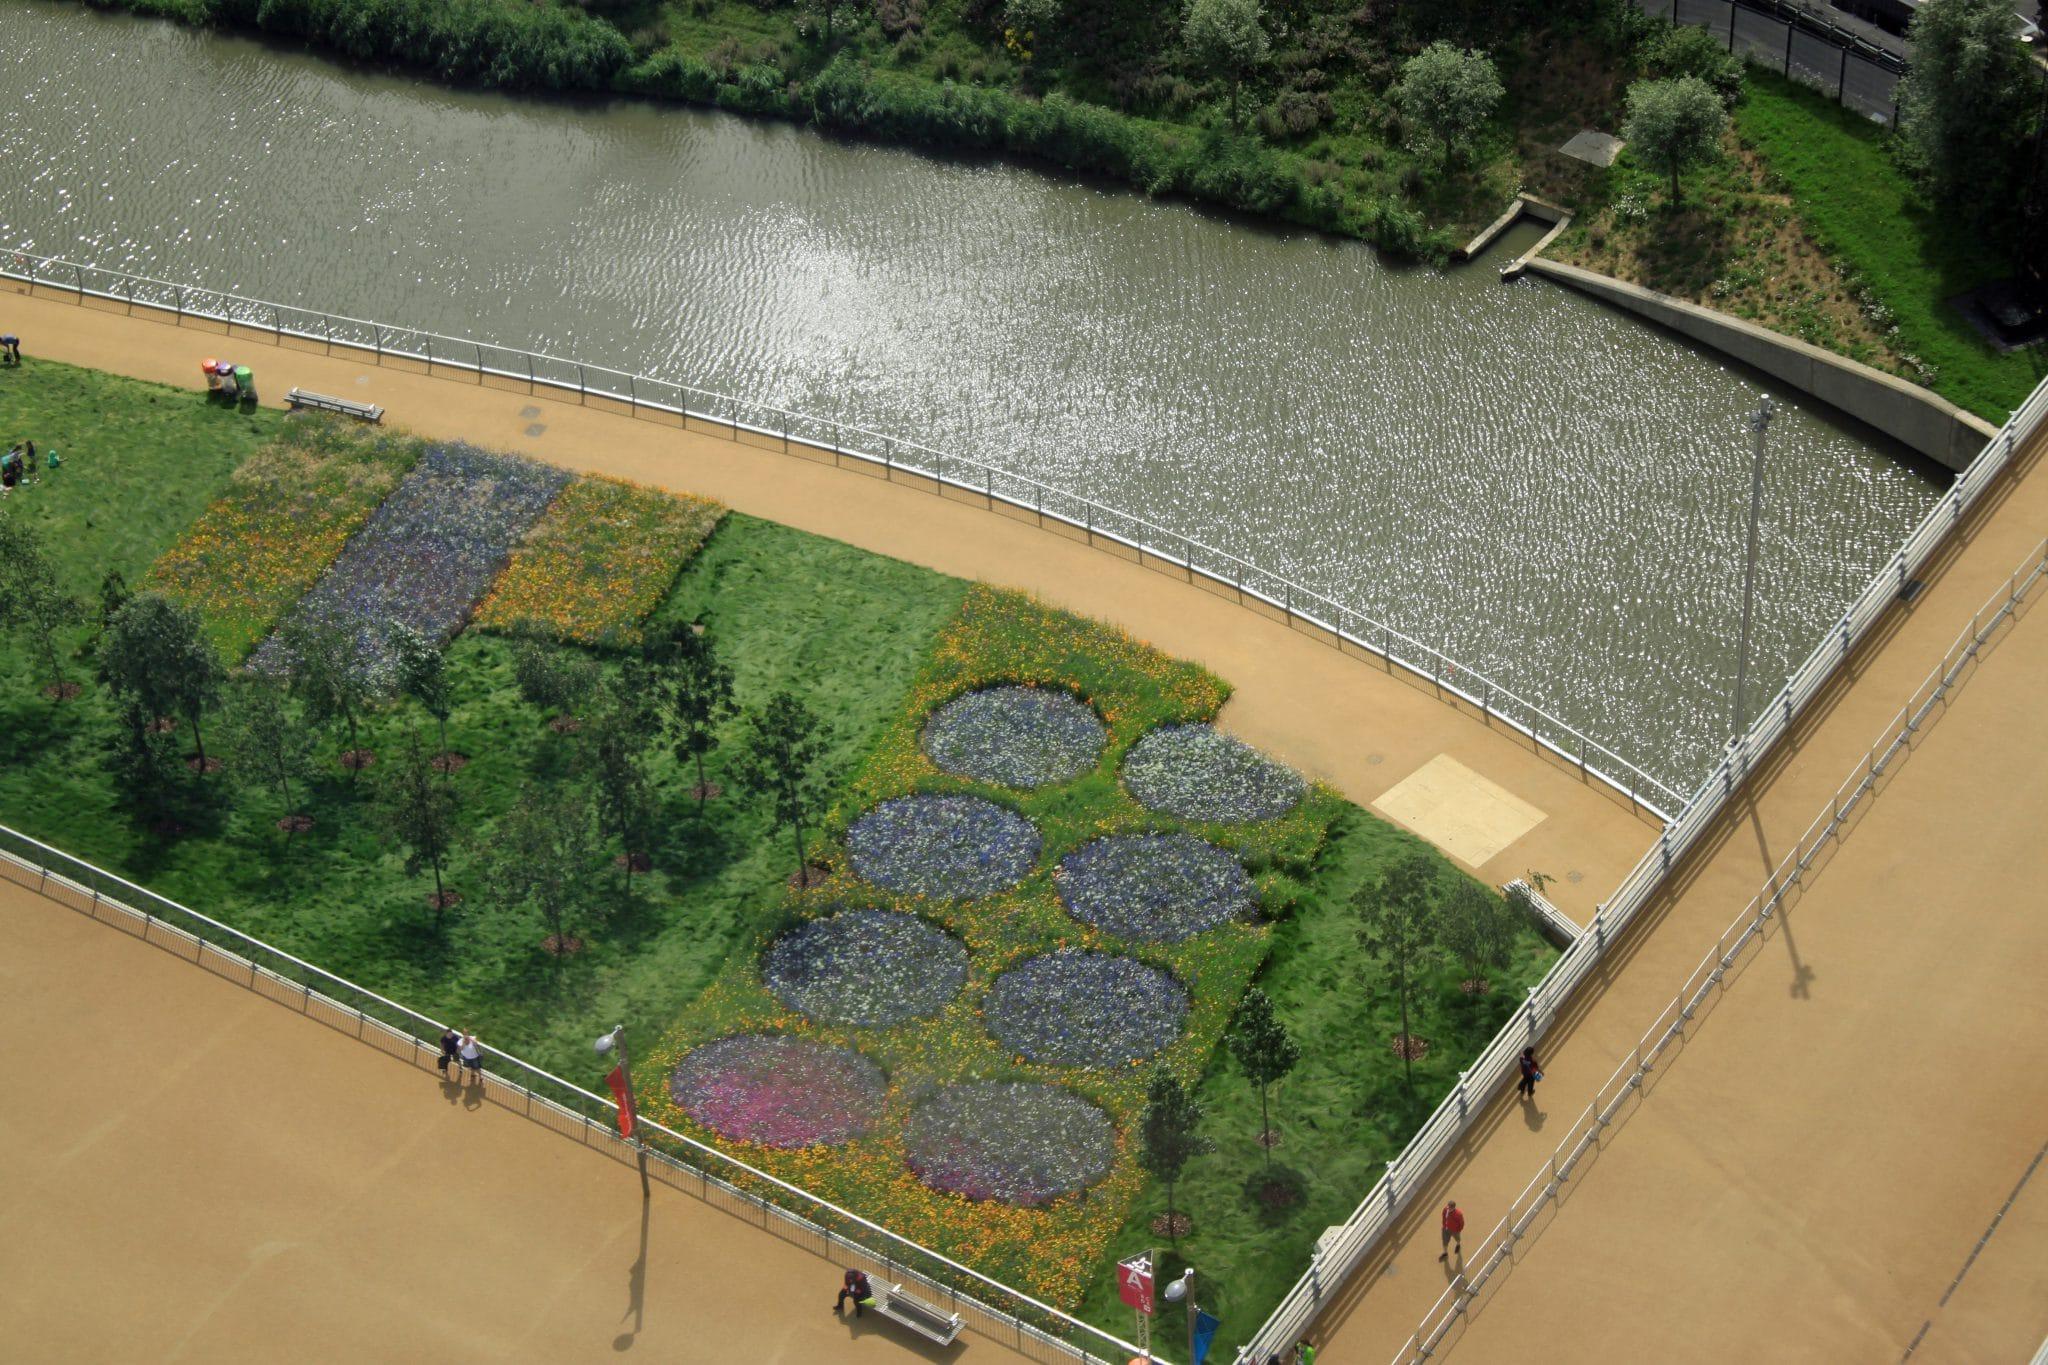 London 2012 Olympics Day Three: ArcelorMittal Orbit views